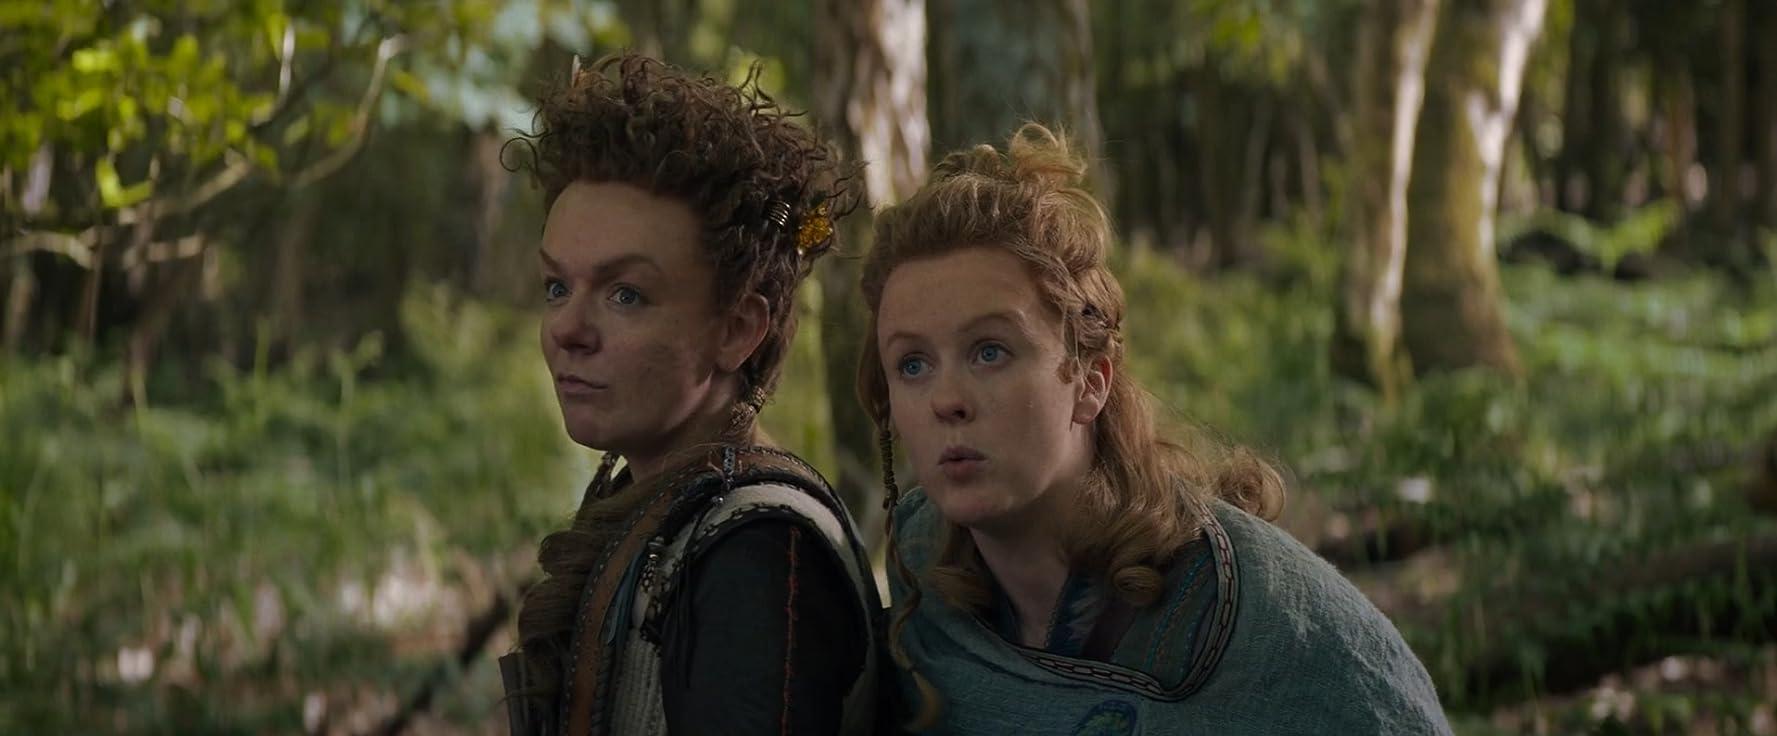 Sheridan Smith and Alexandra Roach in The Huntsman: Winter's War (2016)